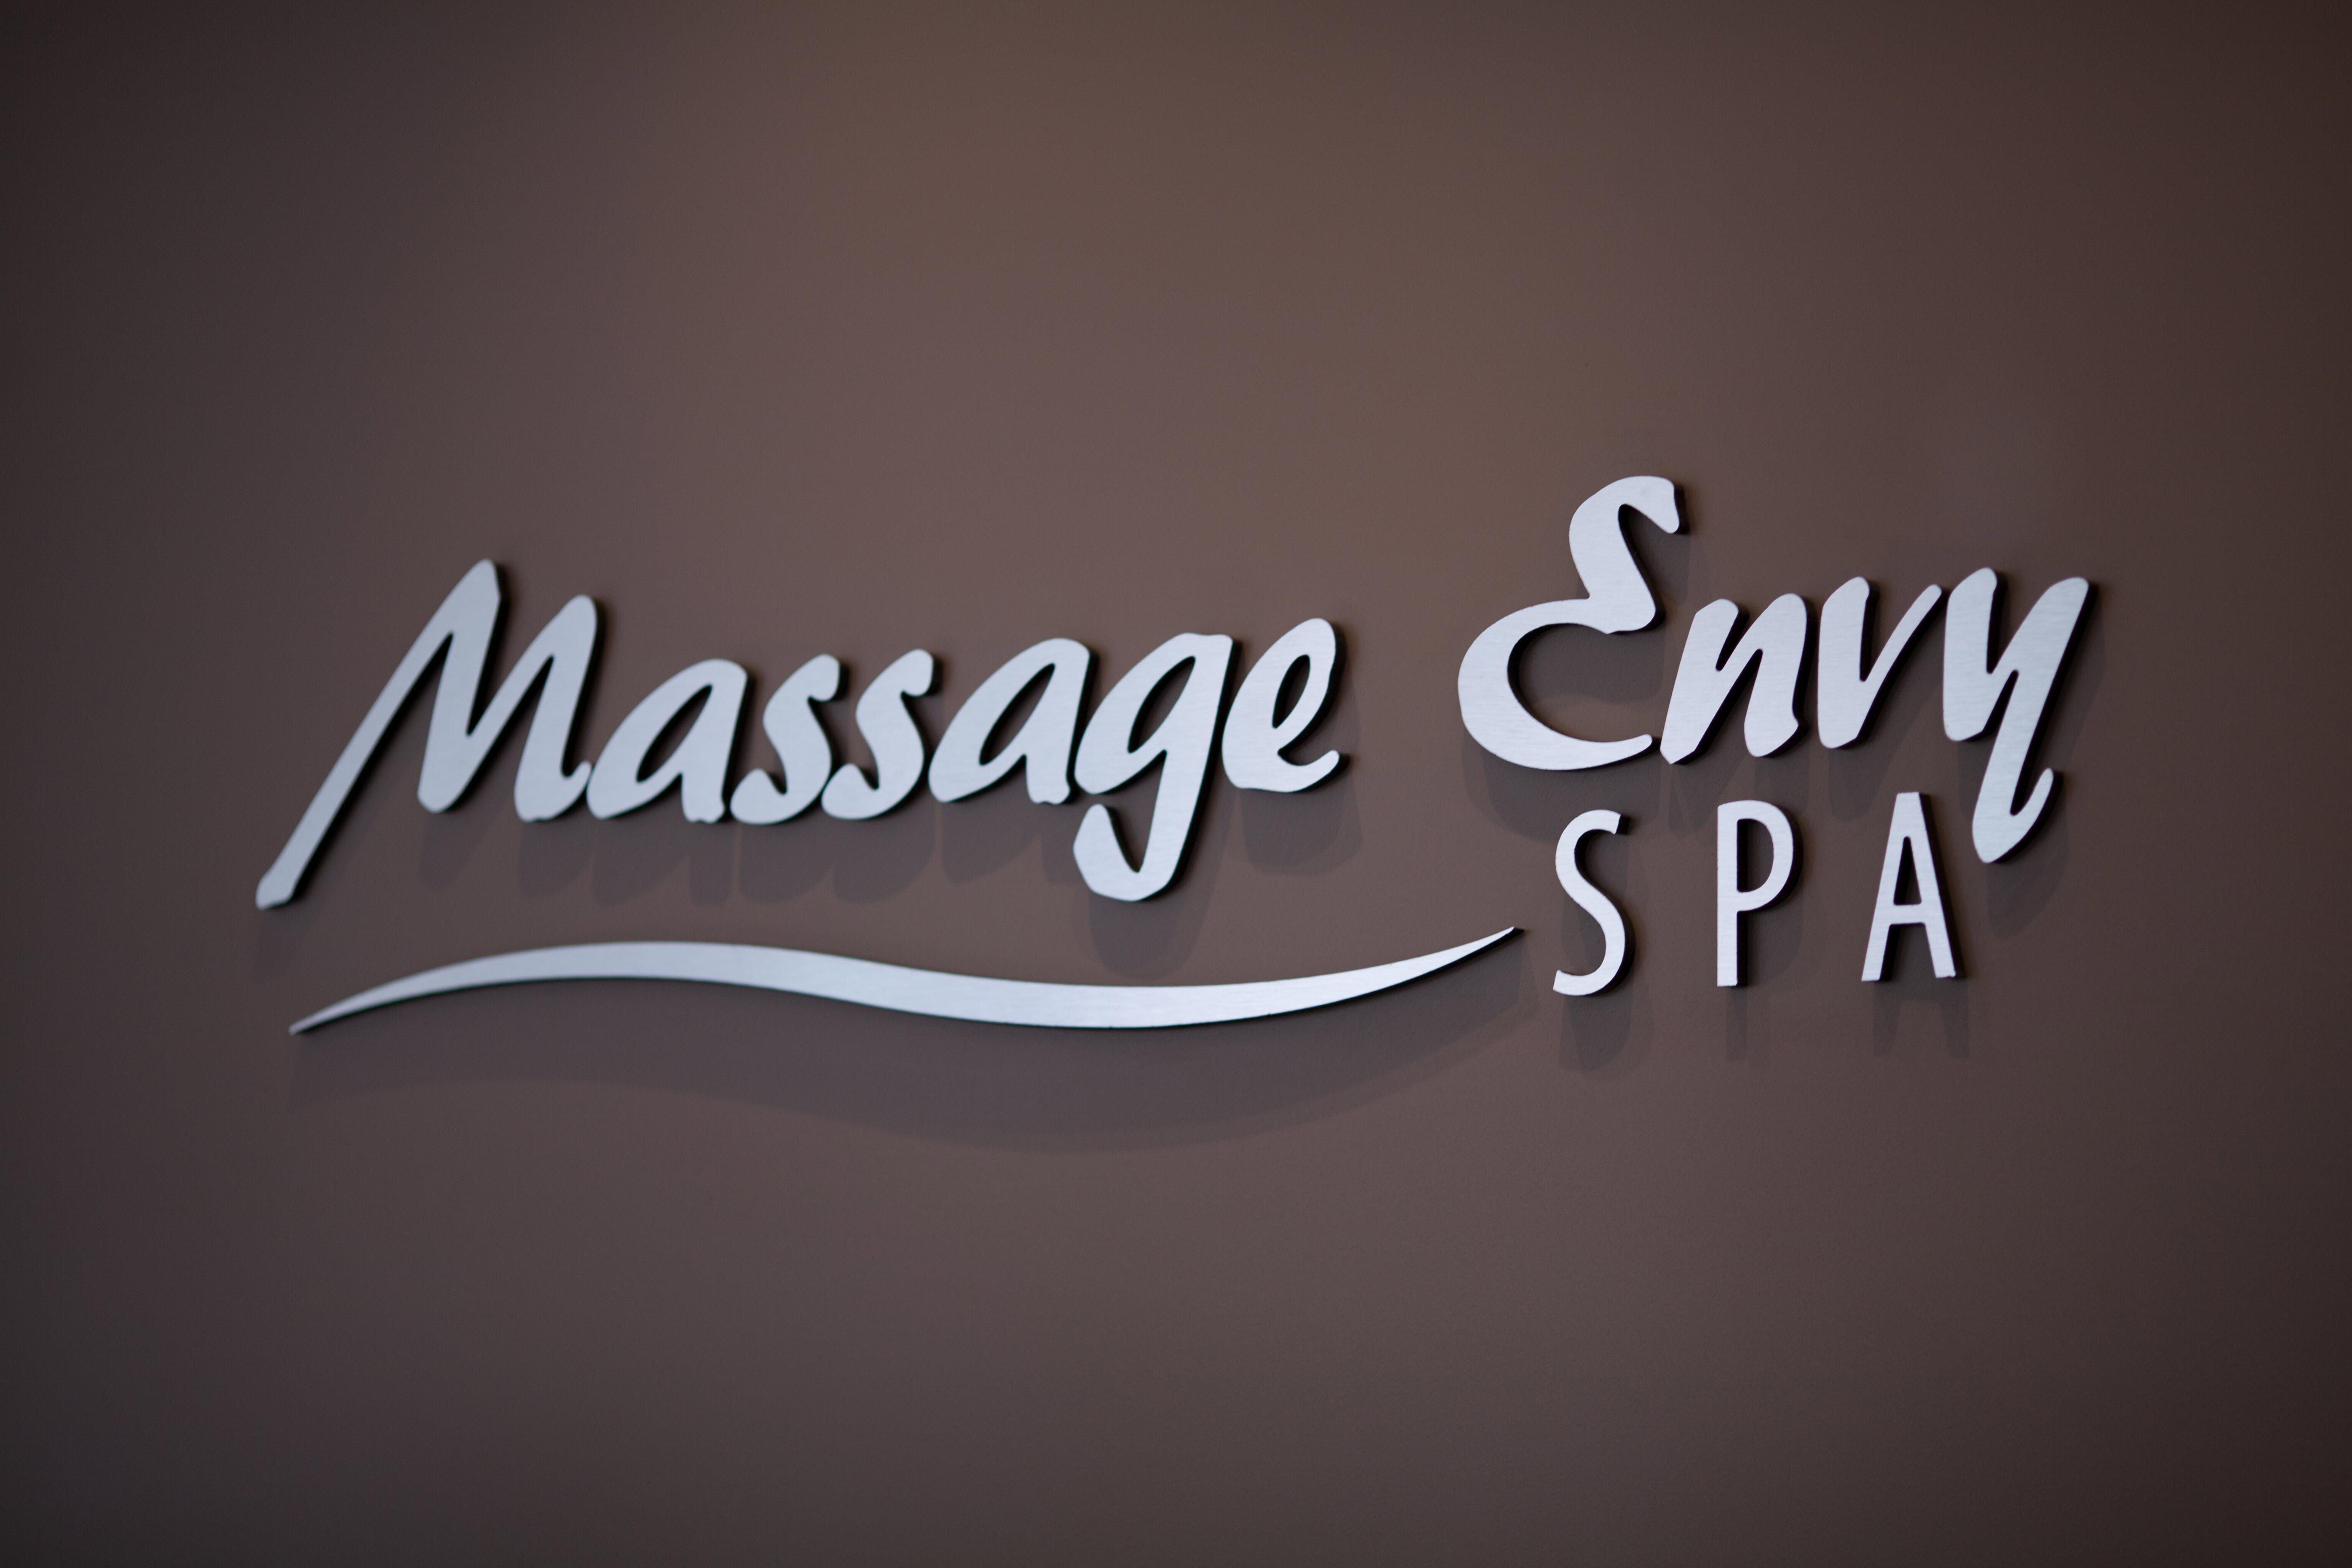 Massage Envy Spa - East Cobb